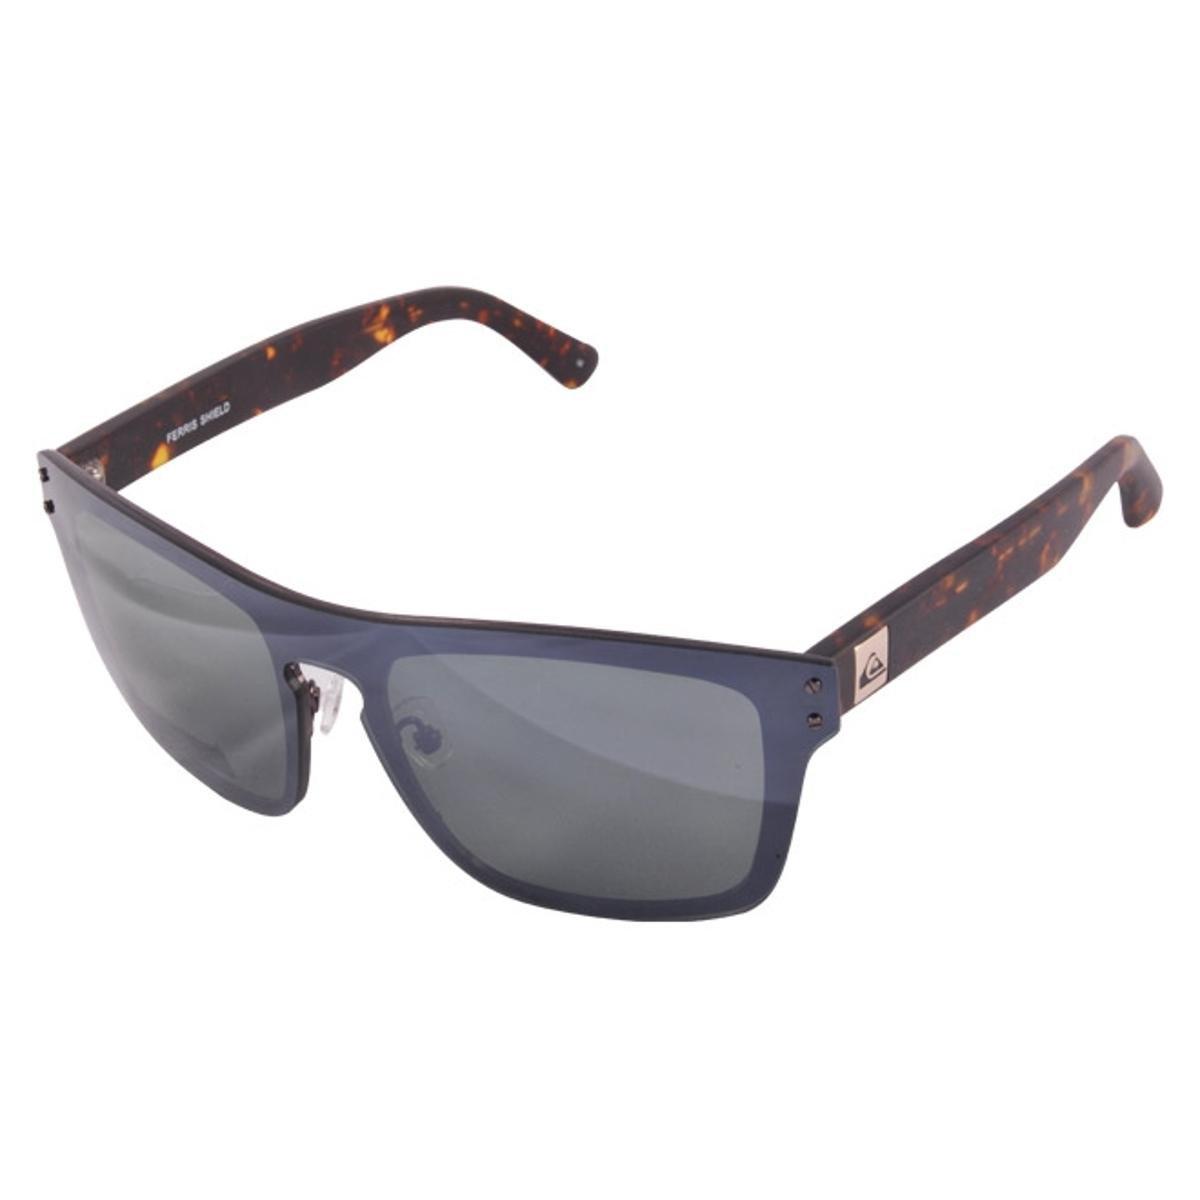 fae7d23446b9f Óculos Quiksilver Ferris Shield - Compre Agora